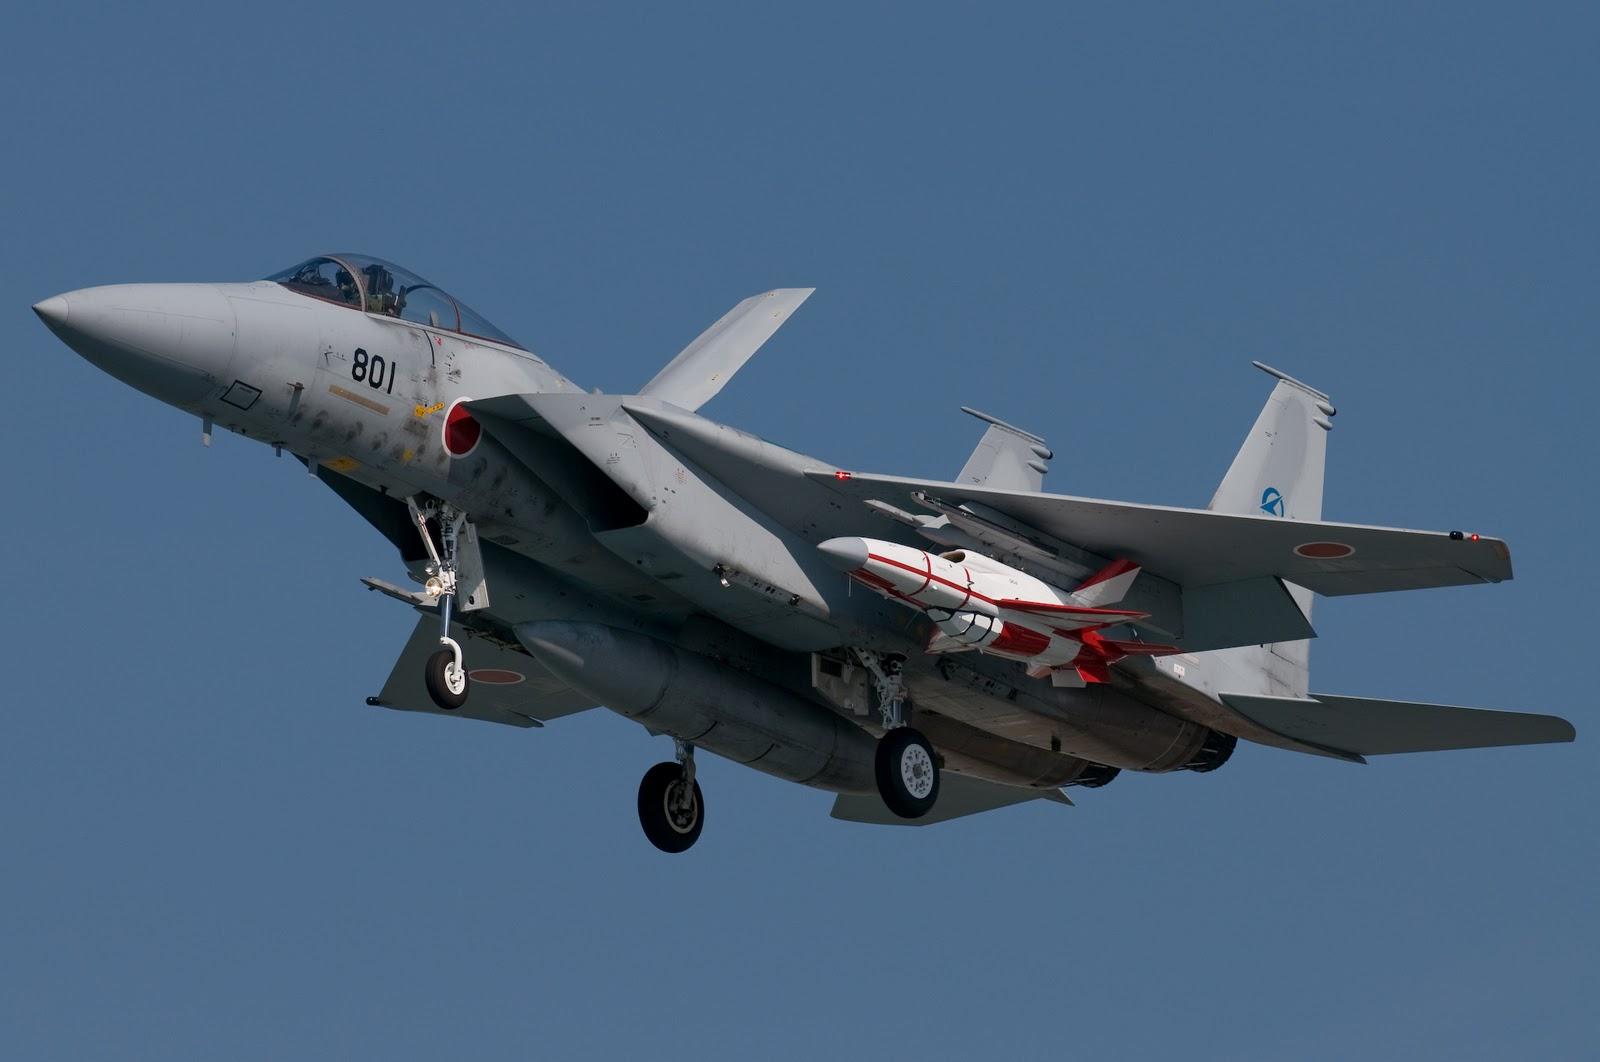 pic new posts: F 15 Cockpit Wallpaper Usaf Fighter Pilot F 22